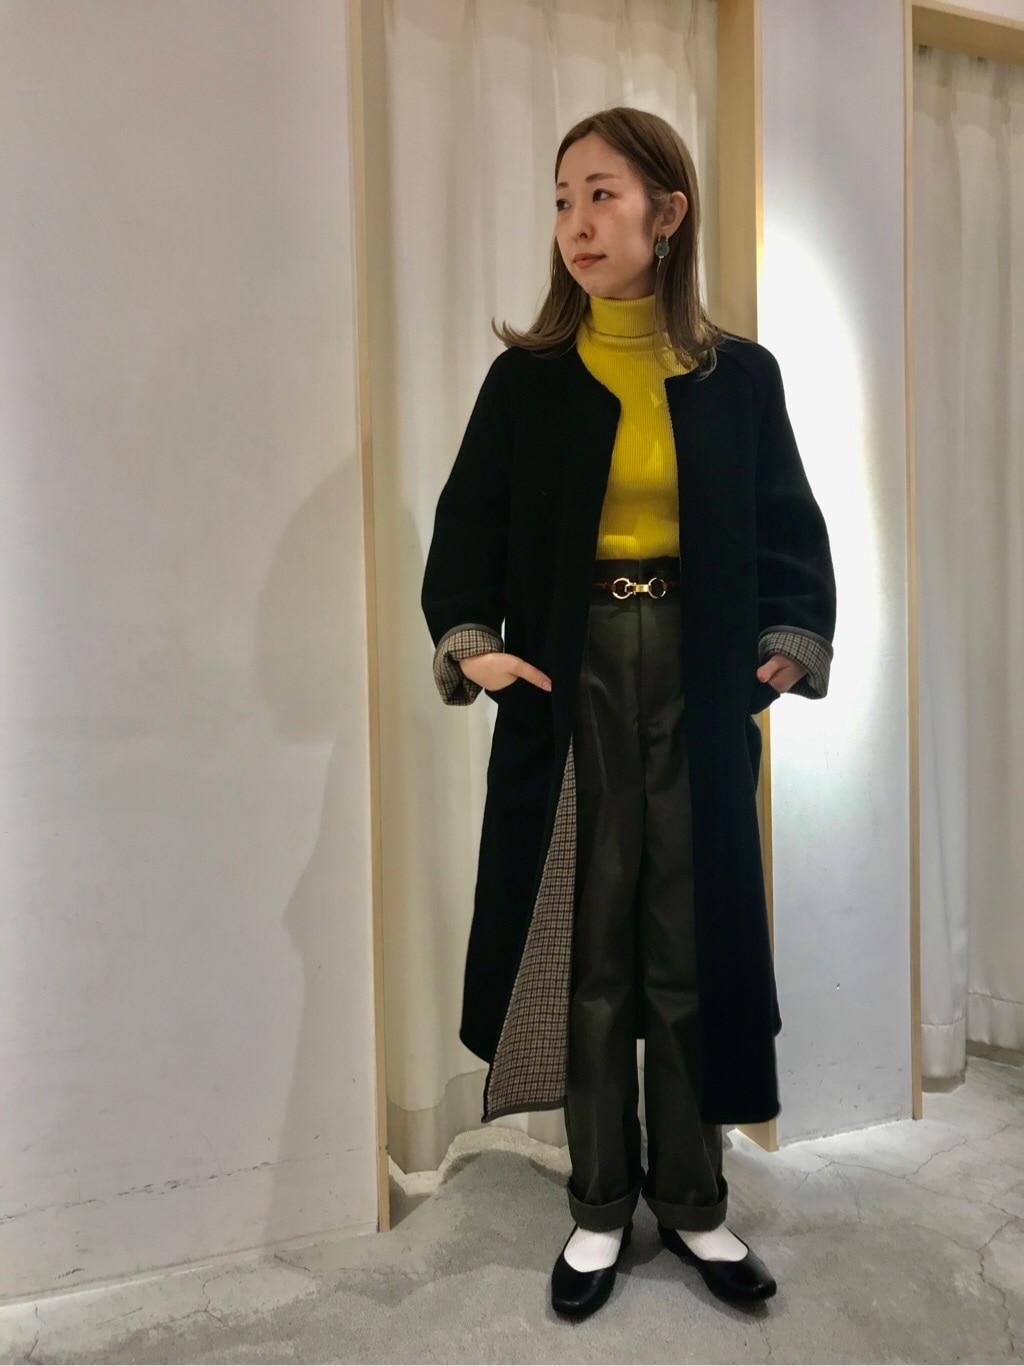 Dot and Stripes CHILD WOMAN ペリエ千葉 身長:155cm 2019.11.30